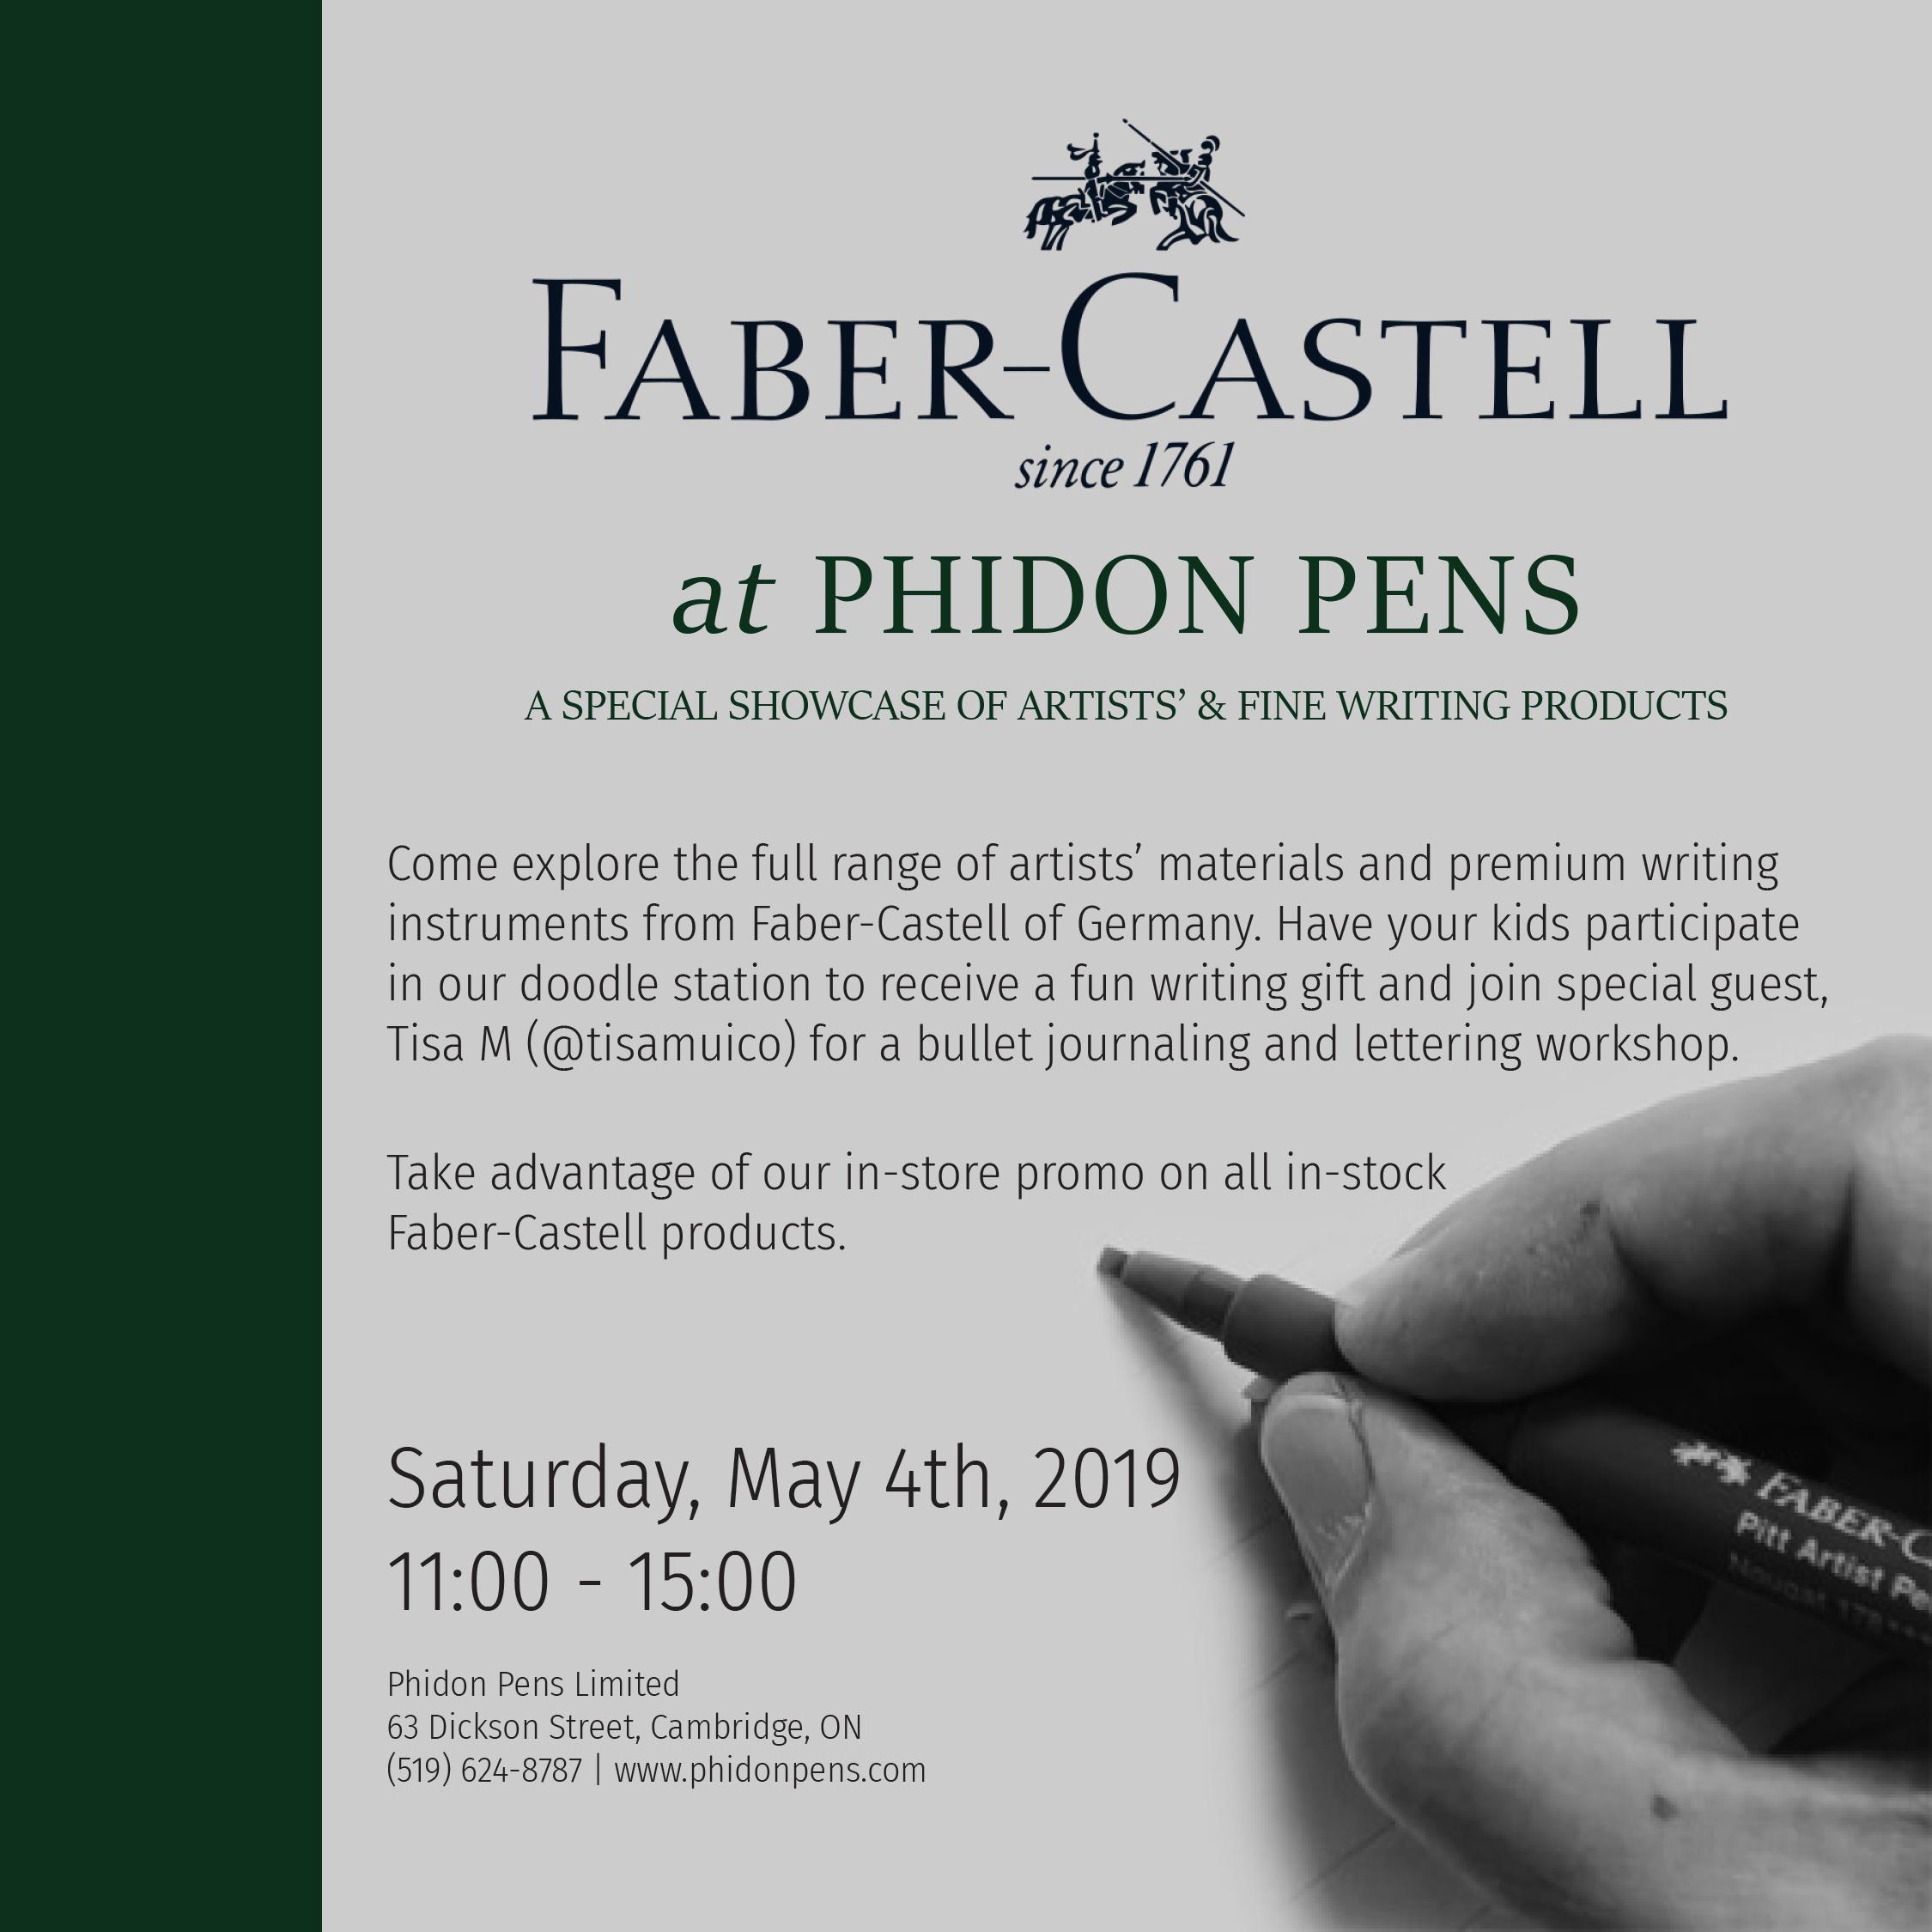 Faber Castell Event Poster-1.jpg